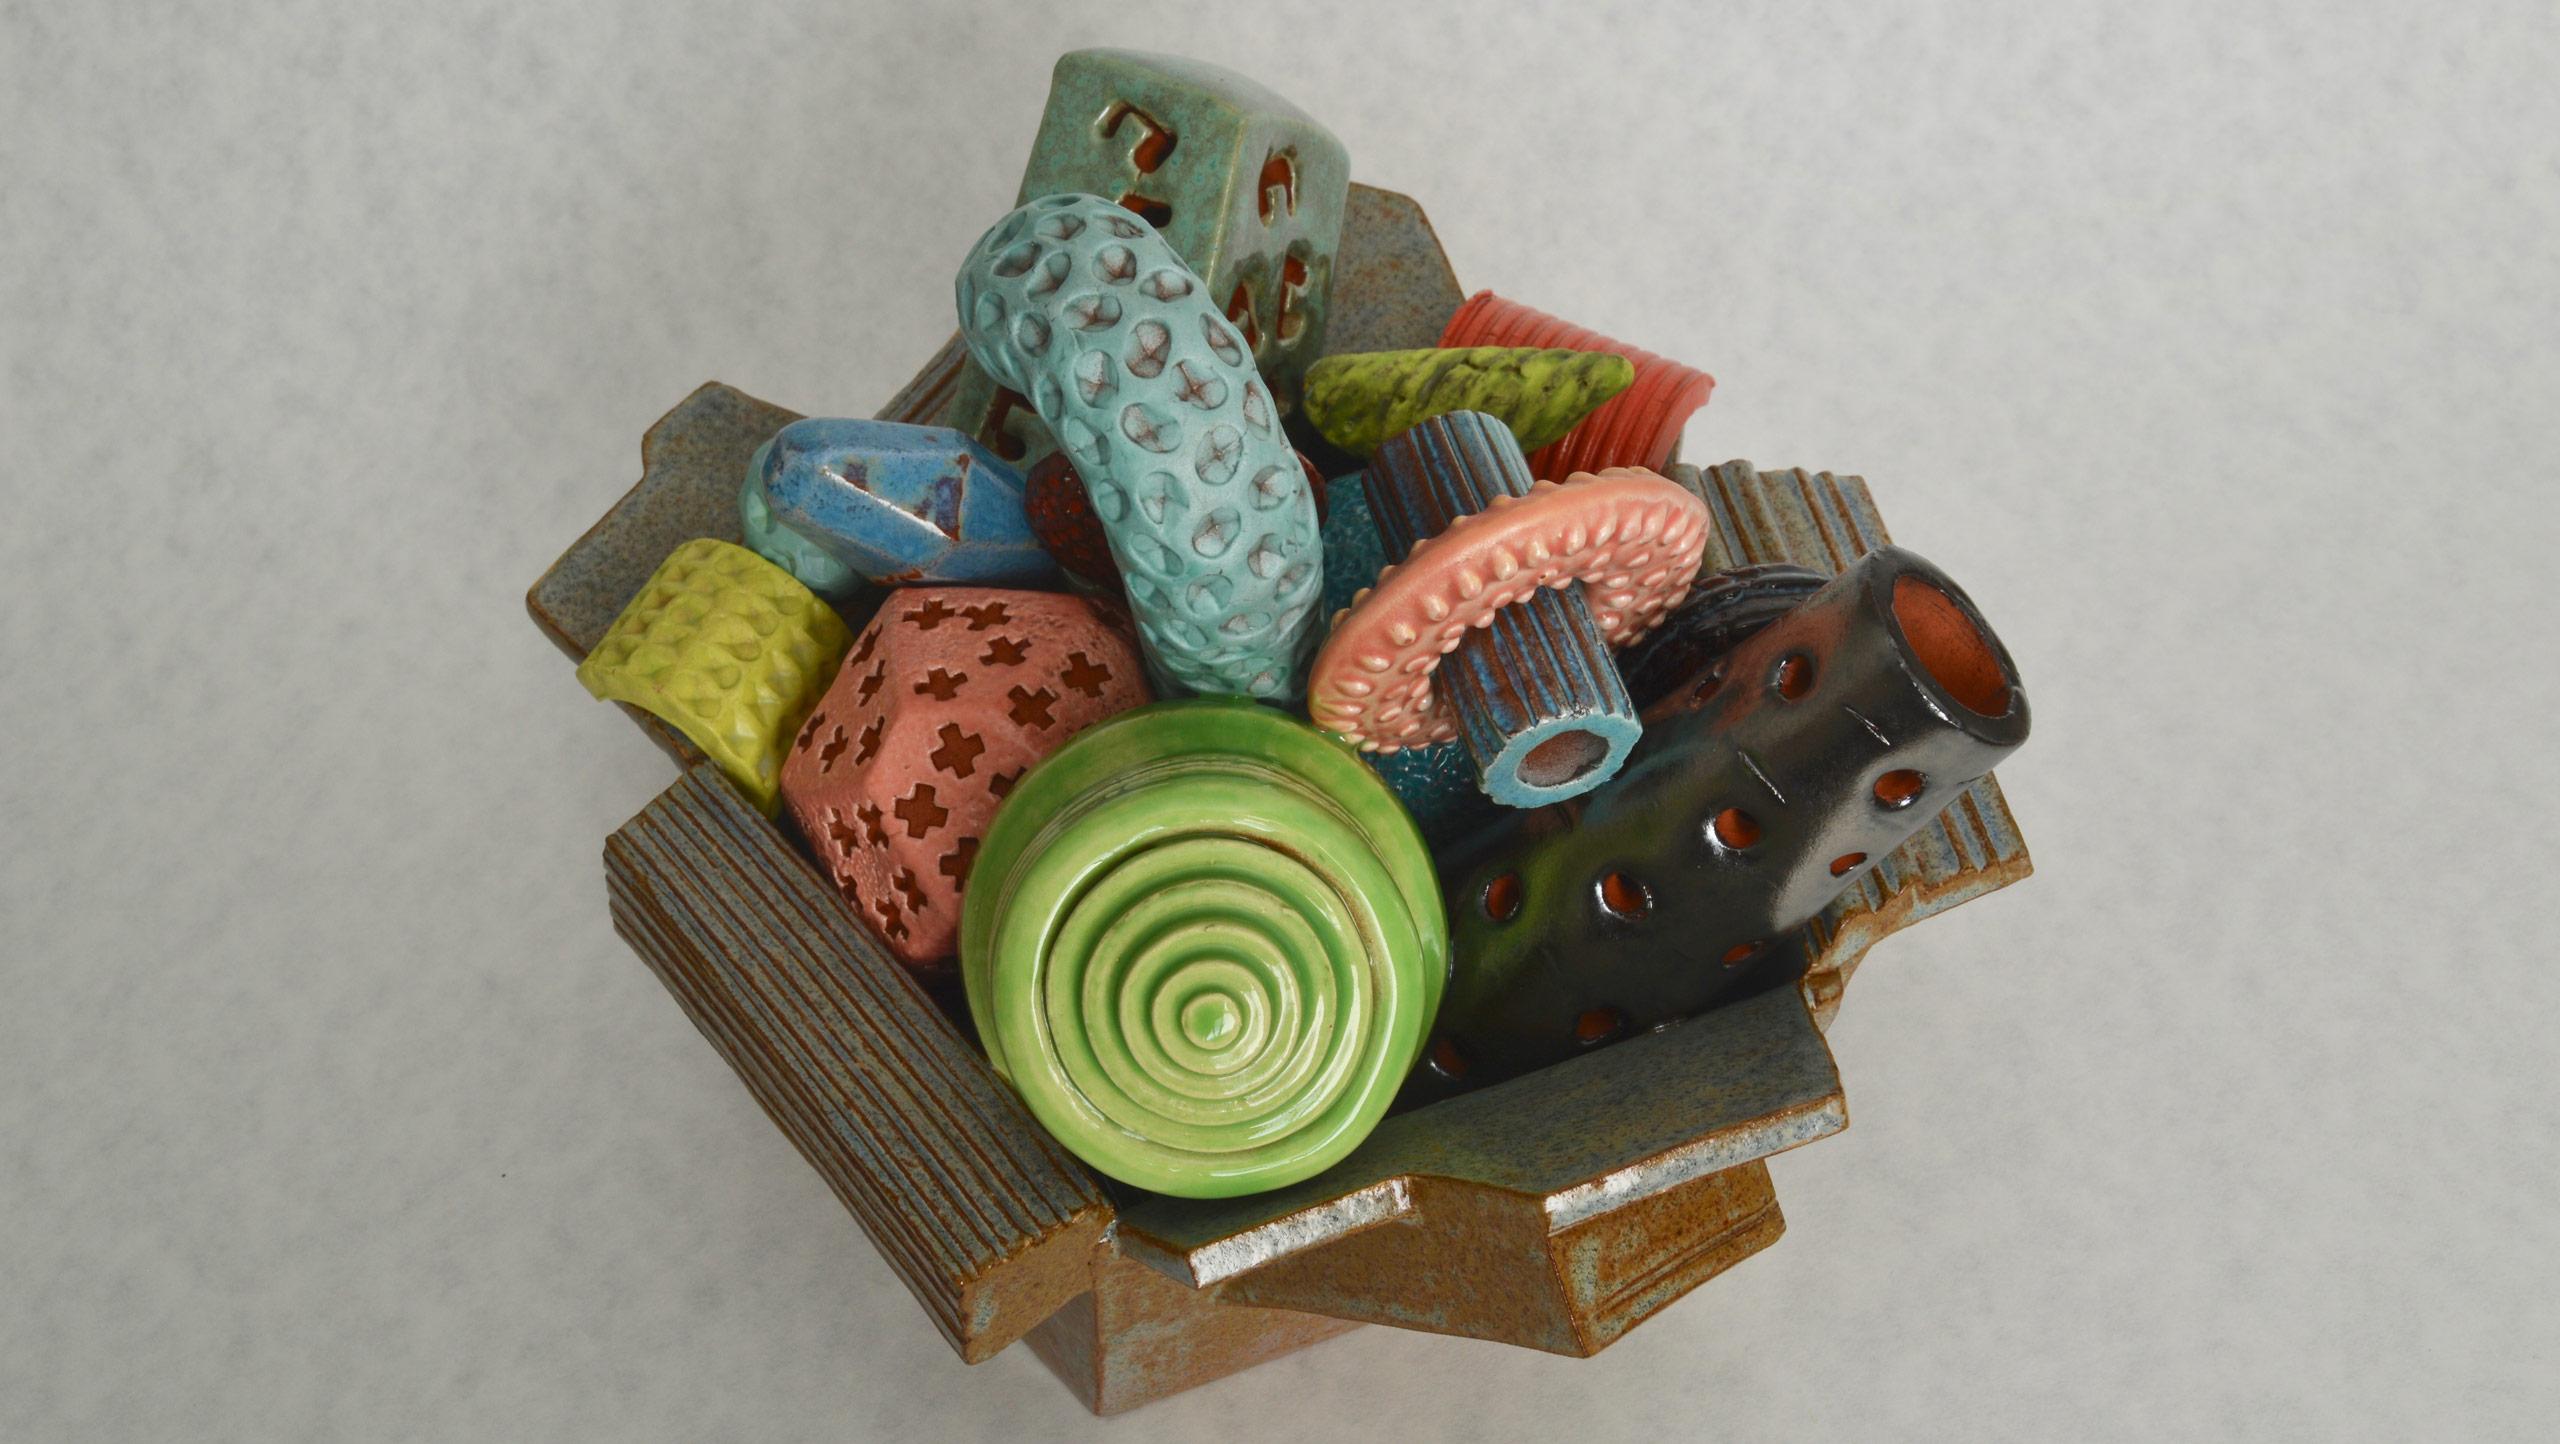 Ship o' Ferrules, a ceramic still-life in glazed earthenware by sculptor Simon Fell